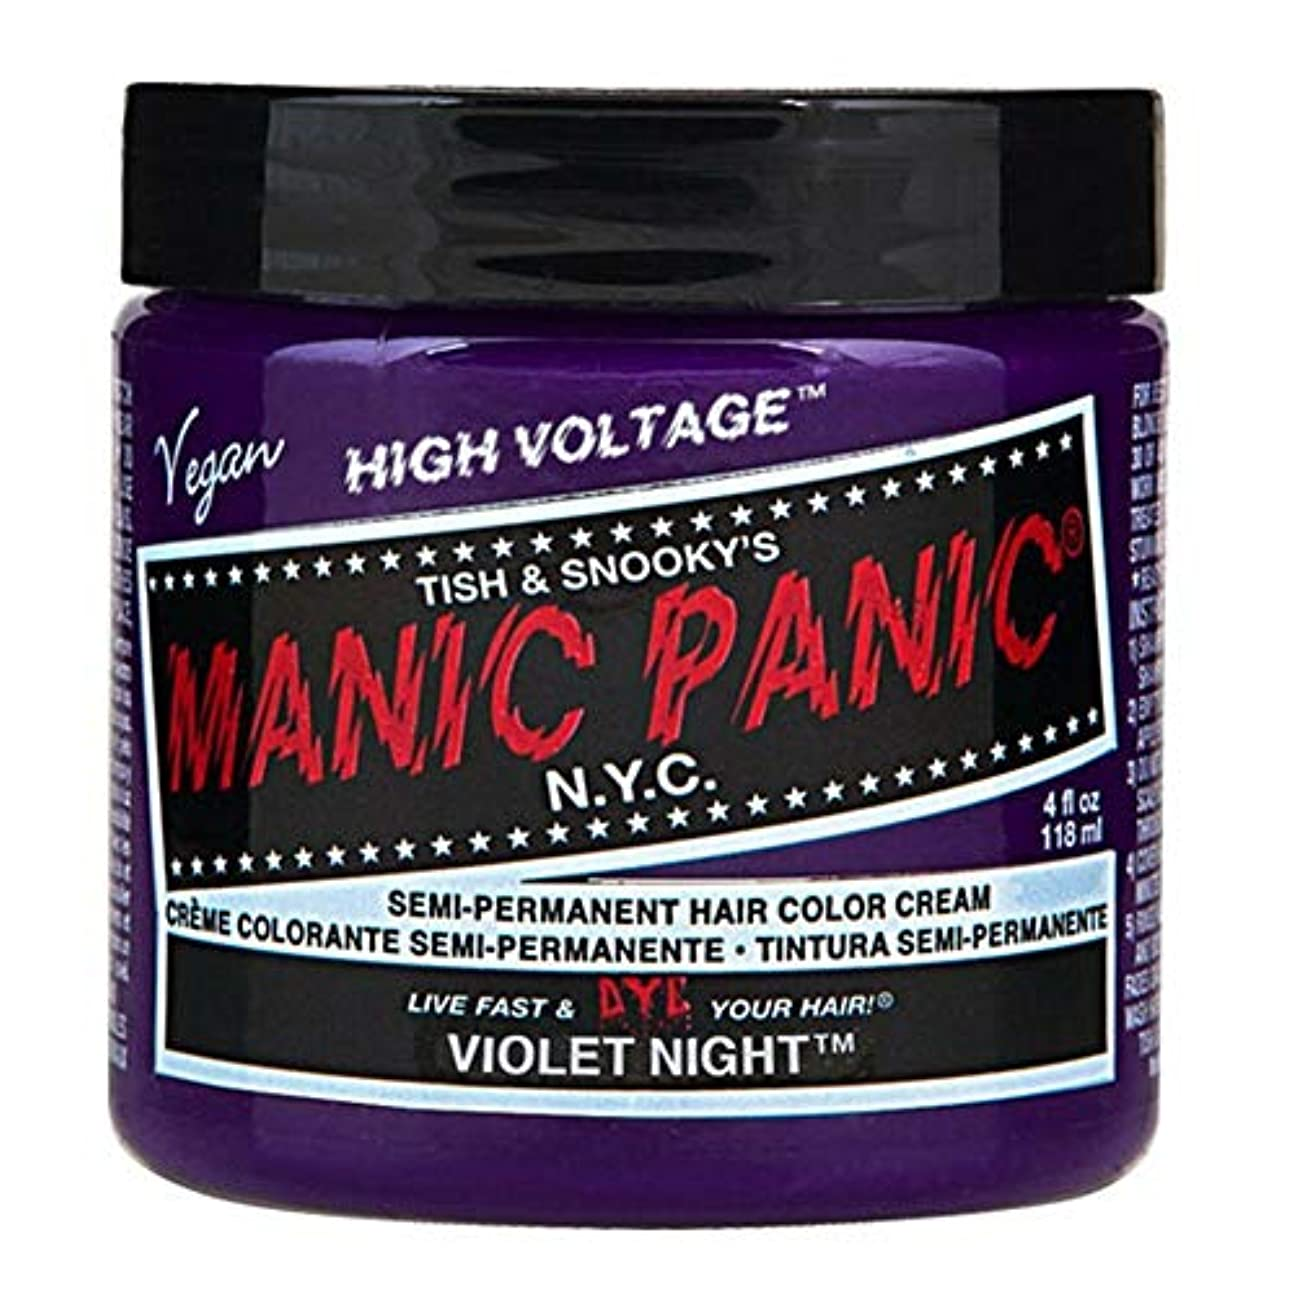 致命的孤児一般的なManic Panic High Voltage Hair Dye - Vegan Hair Dye - Violet Night (dark purple) 118ml